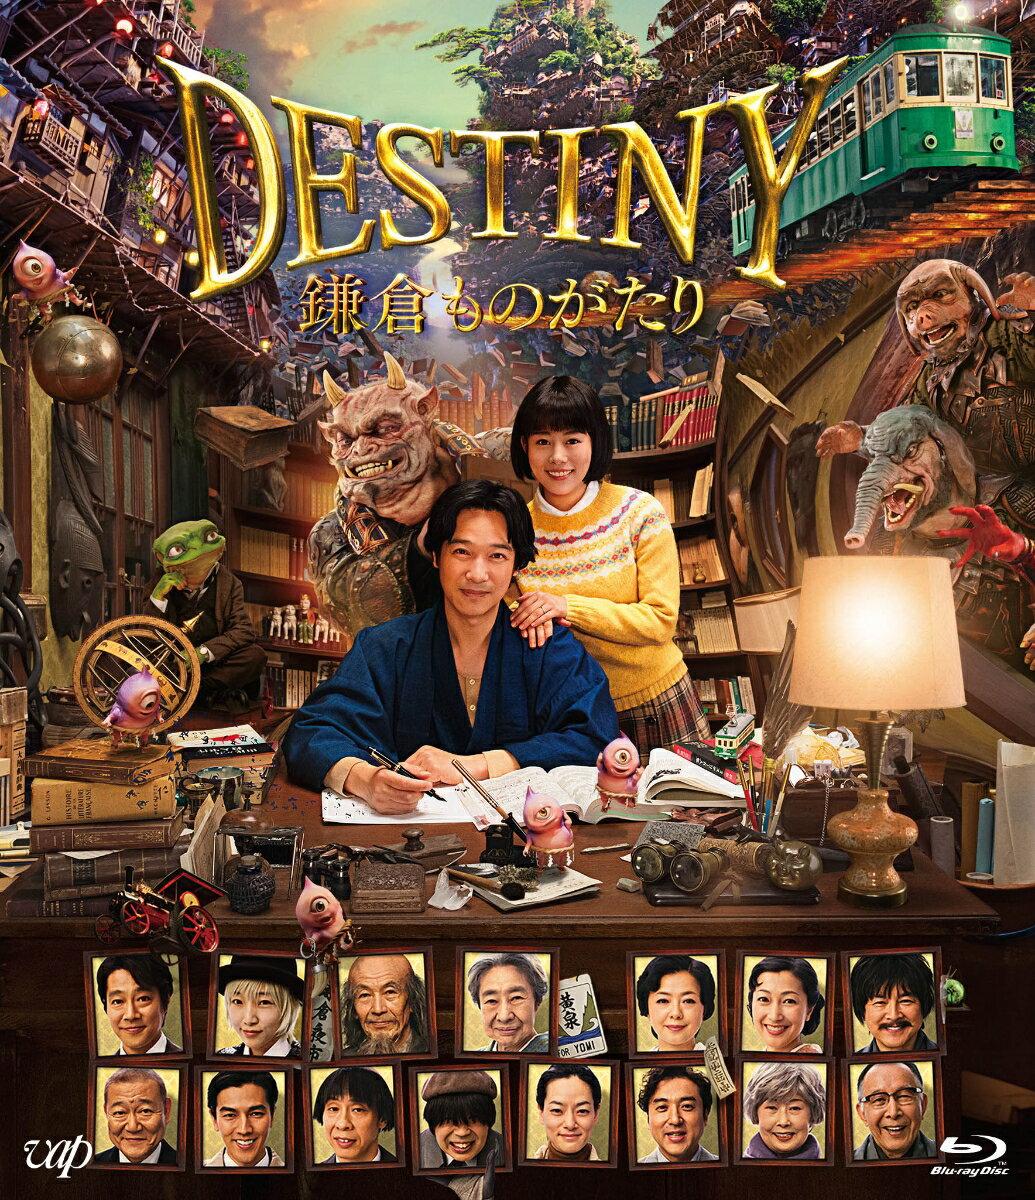 DESTINY 鎌倉ものがたり【Blu-ray】 [ 堺雅人 ]